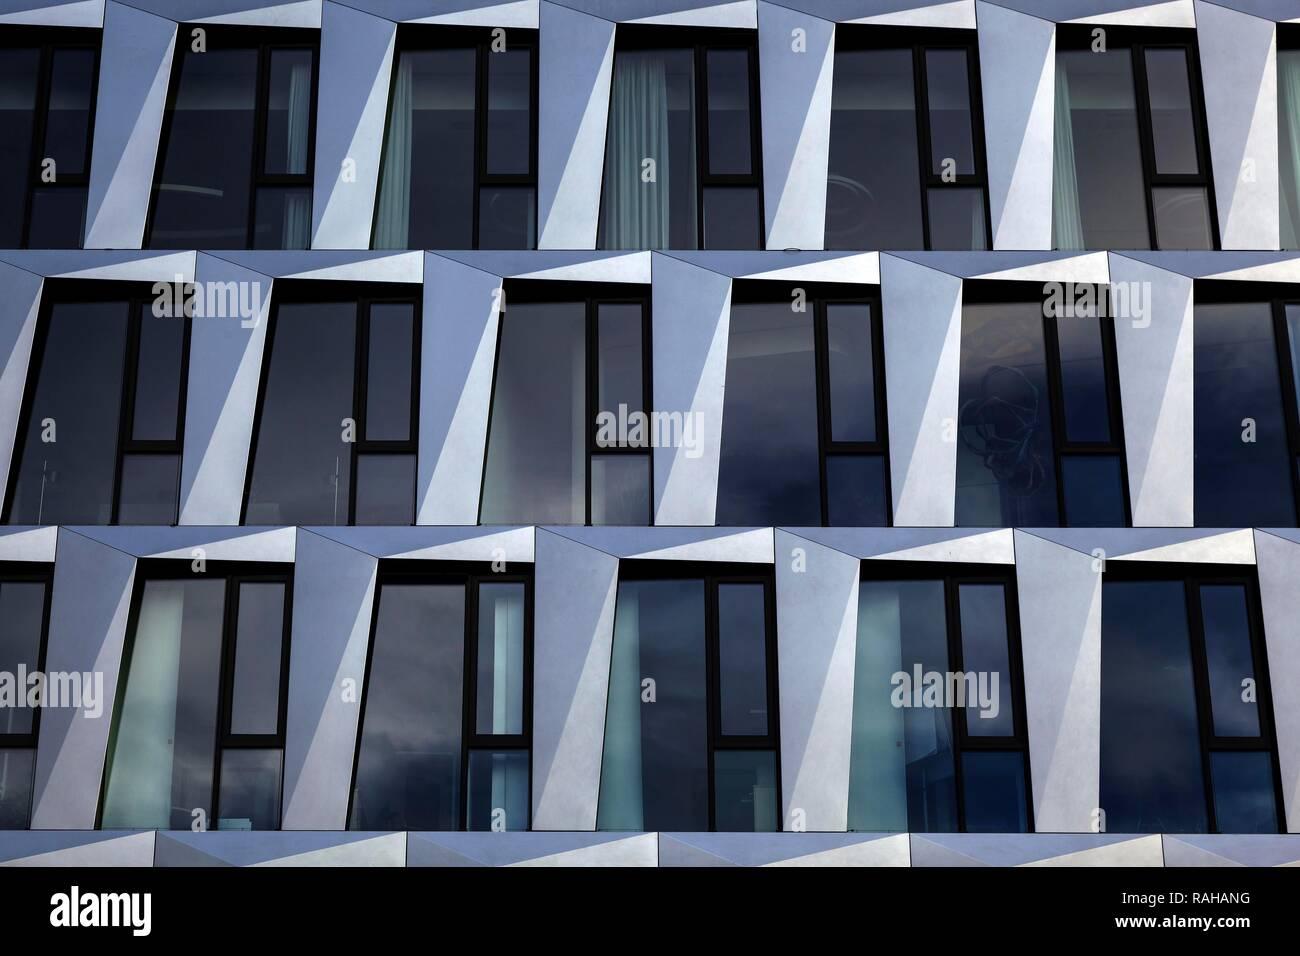 Architecture, house facade, Dorotheen Quartier, DOQU, architect Behnisch, Stuttgart, Baden-Württemberg, Germany Stock Photo